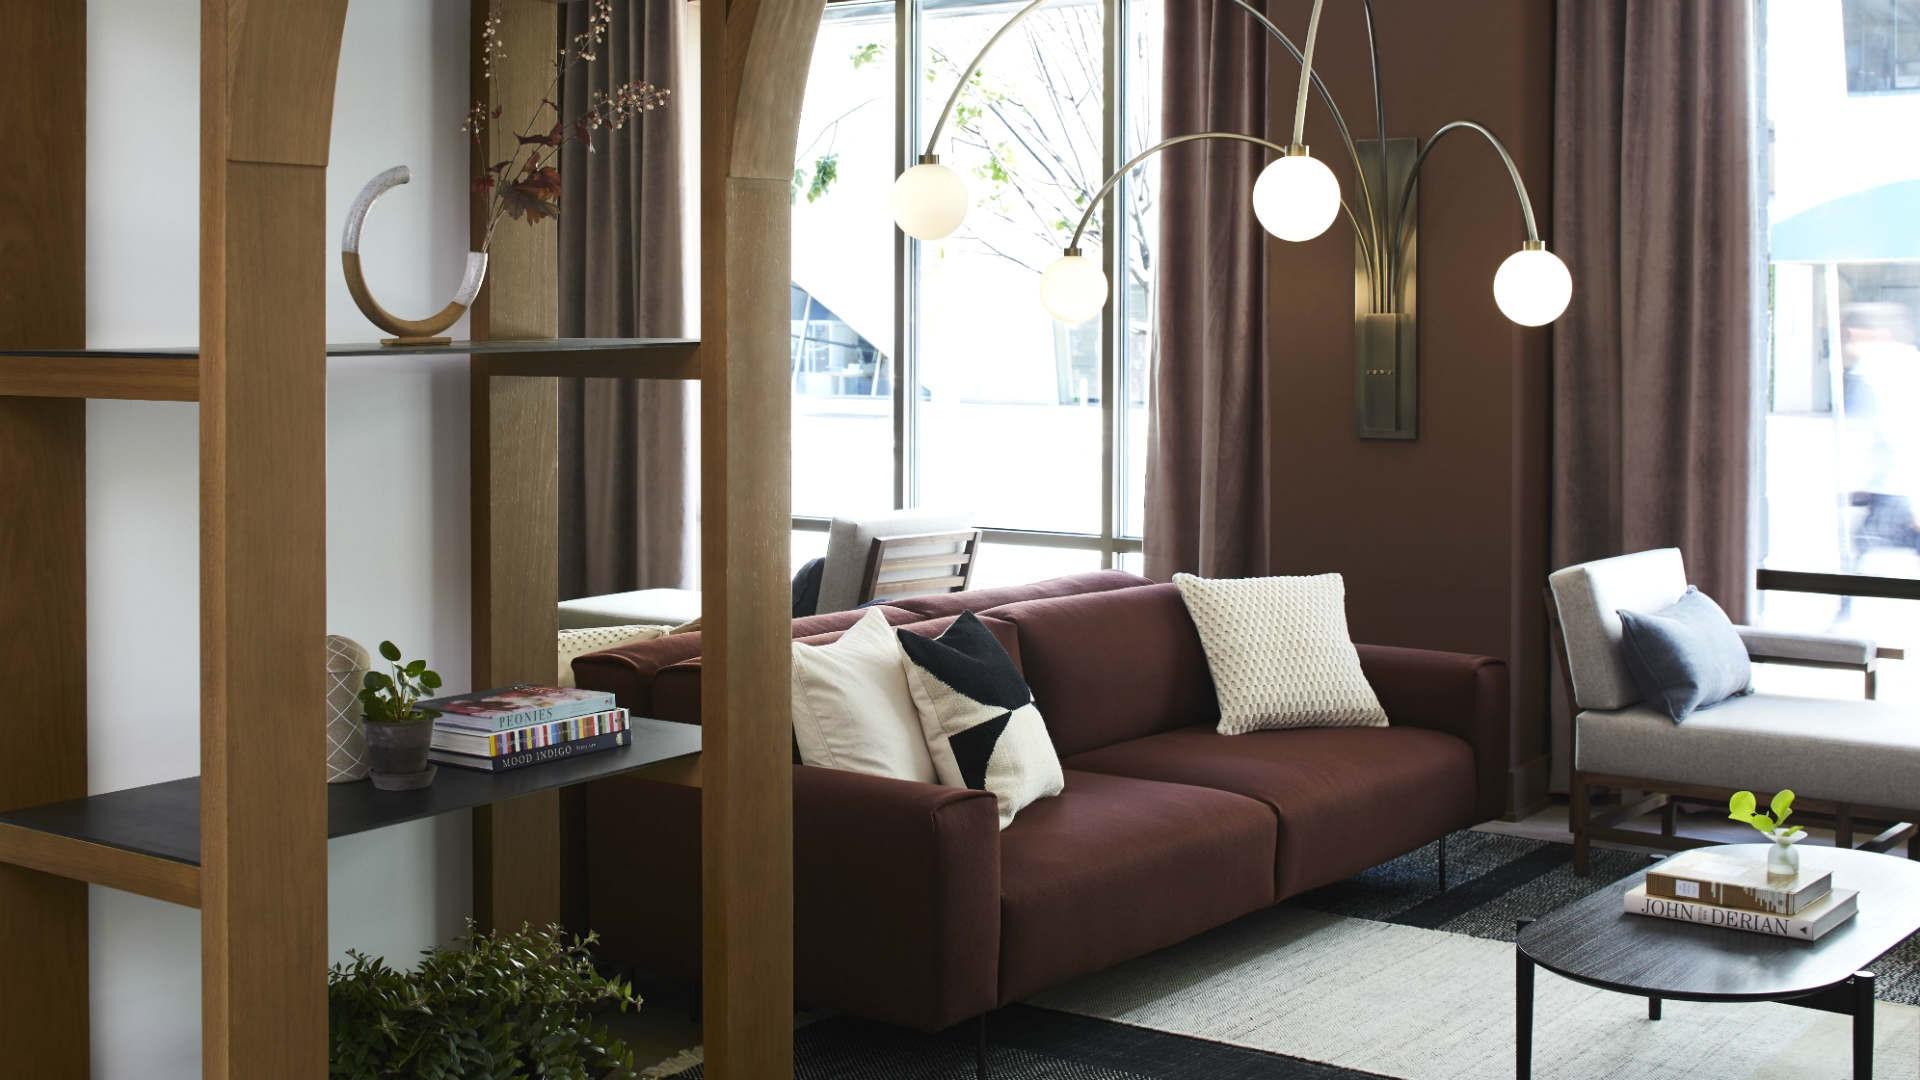 Best hotels Toronto staycation | Kimpton Saint George lobby